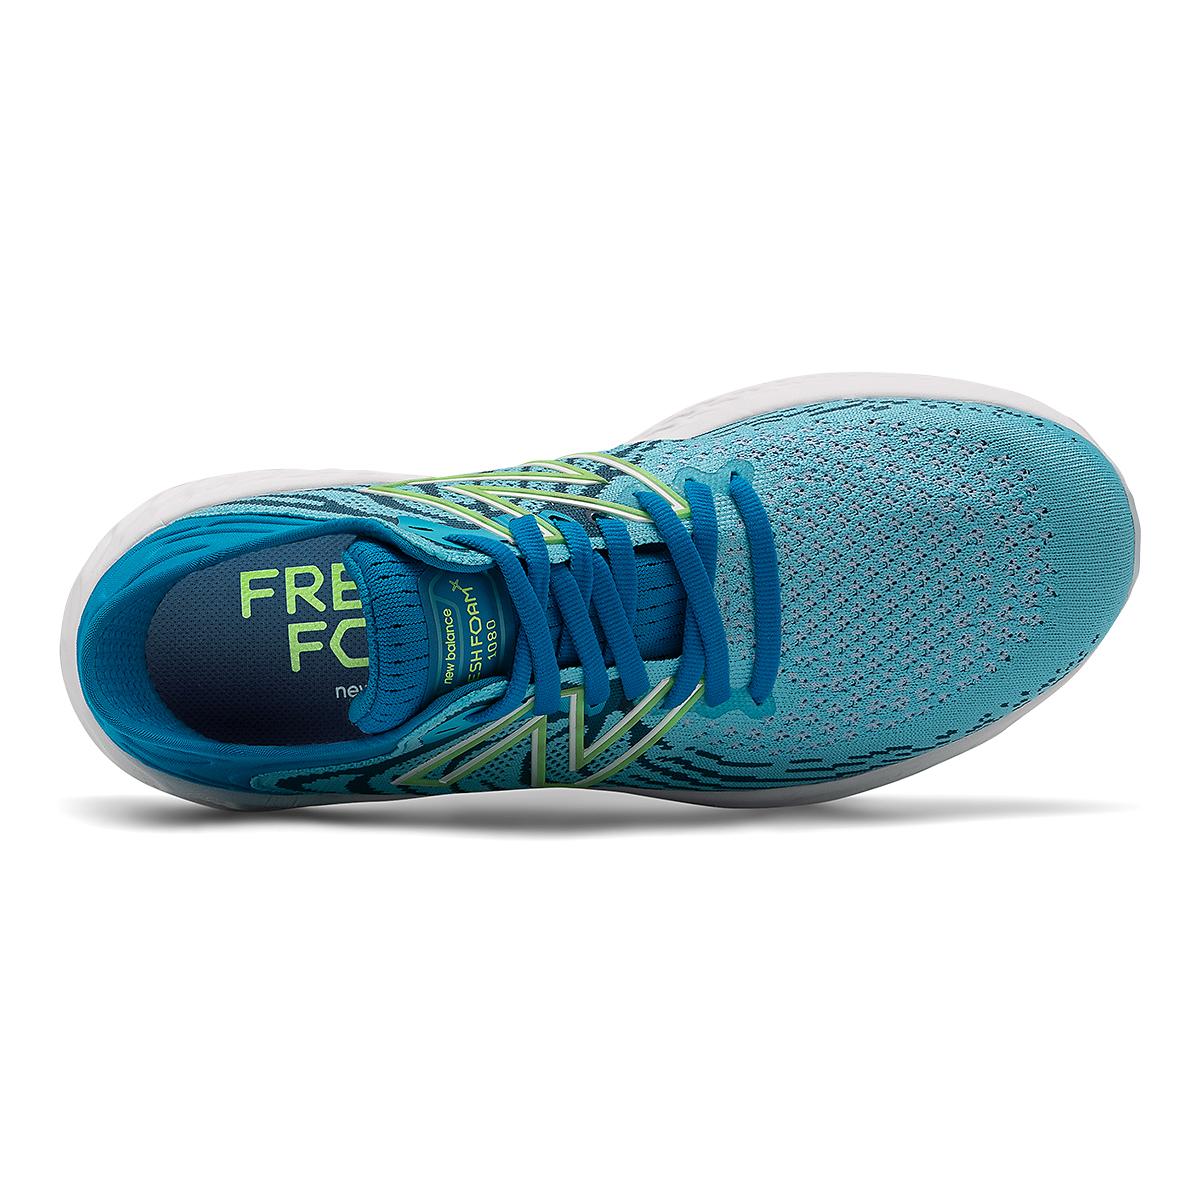 Women's New Balance Fresh Foam 1080v11 Running Shoe - Color: Virtual Sky/Bleached Lime Glo - Size: 5 - Width: Narrow, Virtual Sky/Bleached Lime Glo, large, image 4